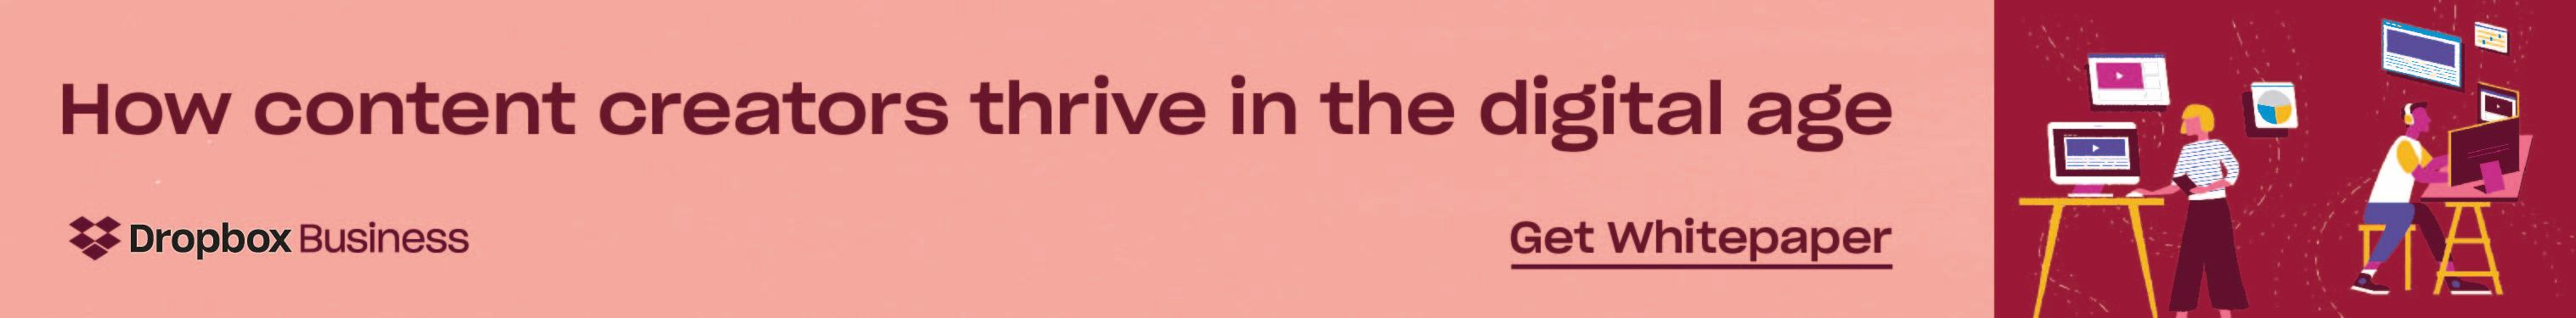 Content creators banner promoting Dropbox media whitepaper